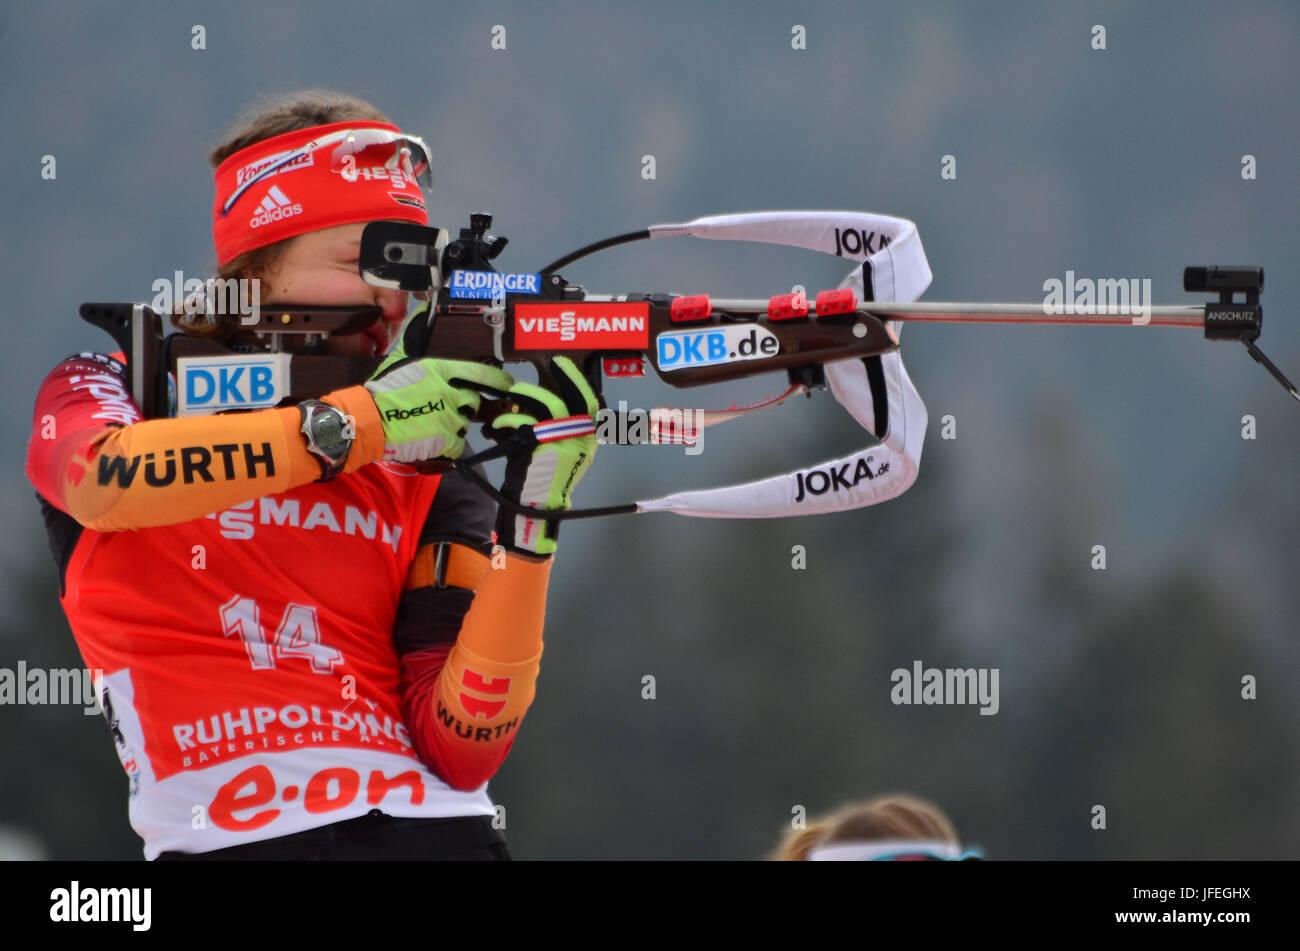 Wintersport, Biathlon, Weltmeisterschaft, Ruhpolding, schießen stehend, Laura Dahlmeier, GER Stockbild